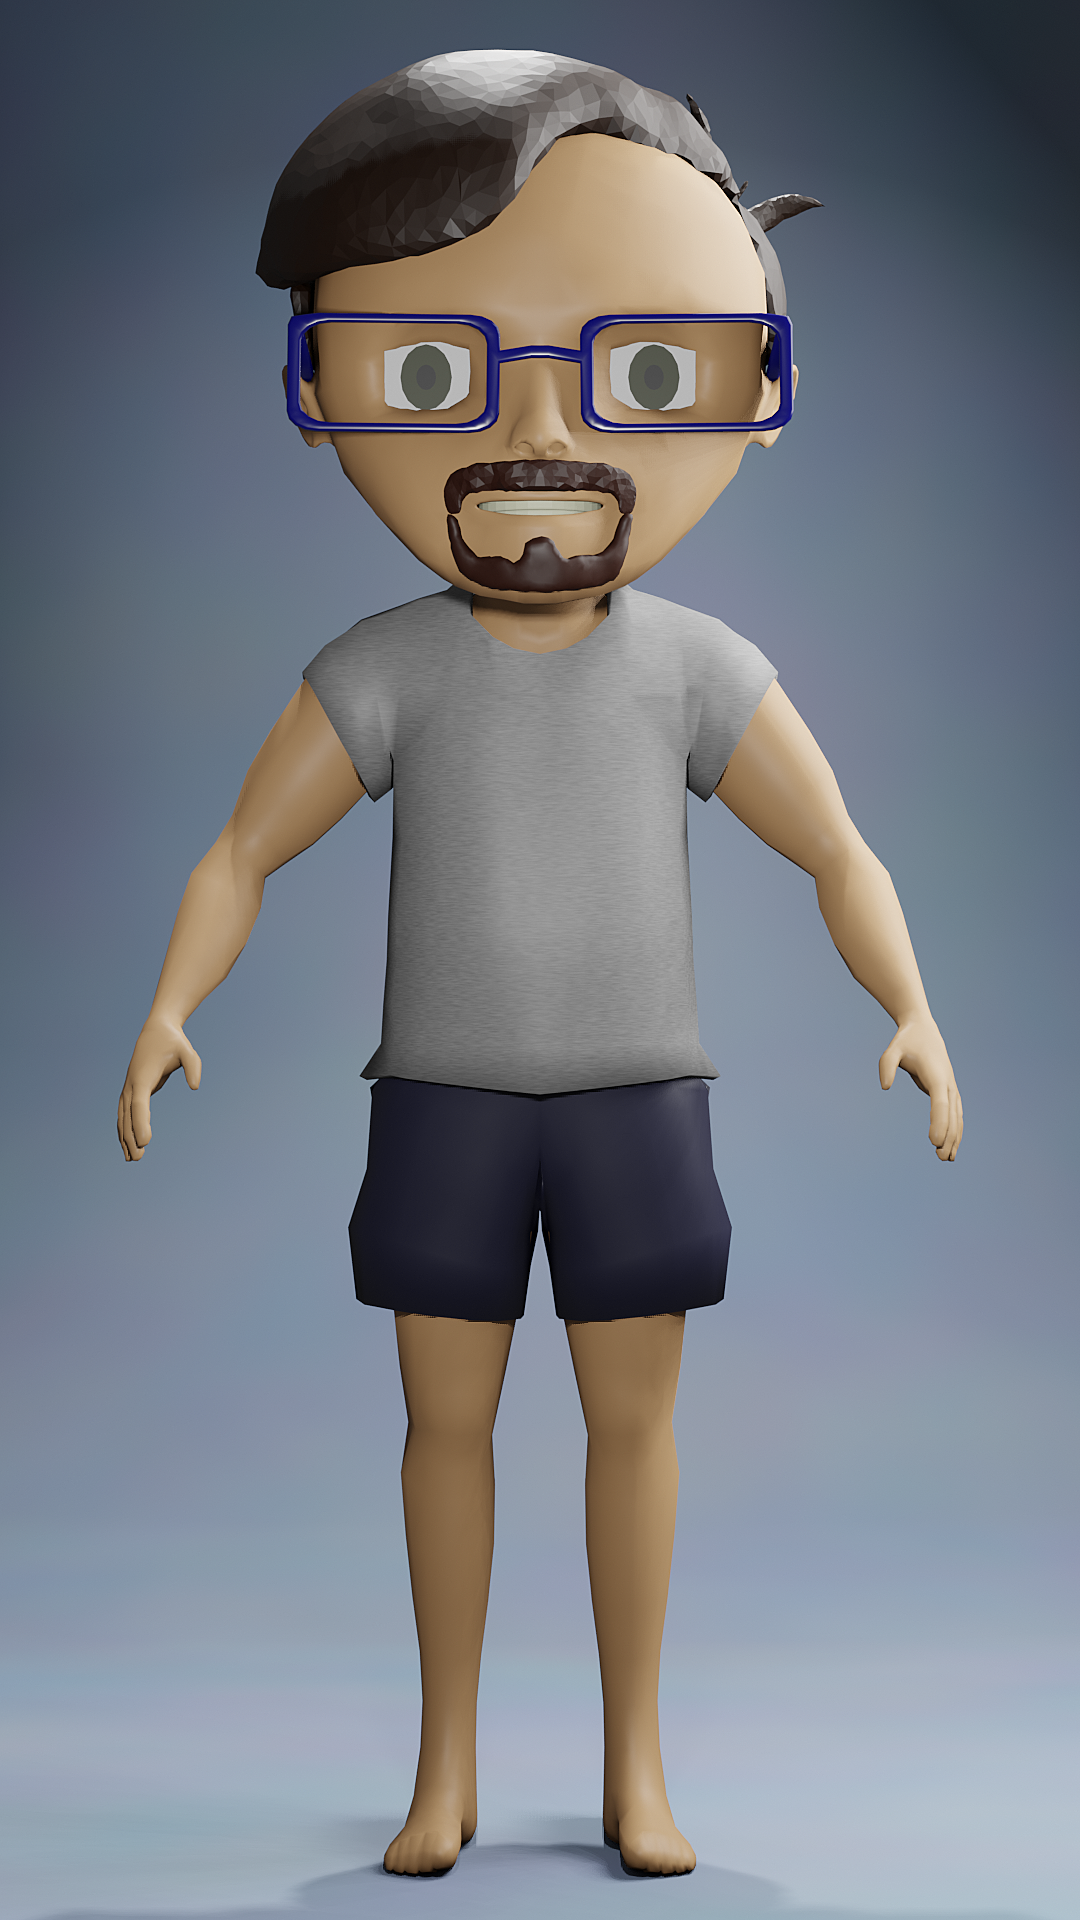 Self portrait chibi